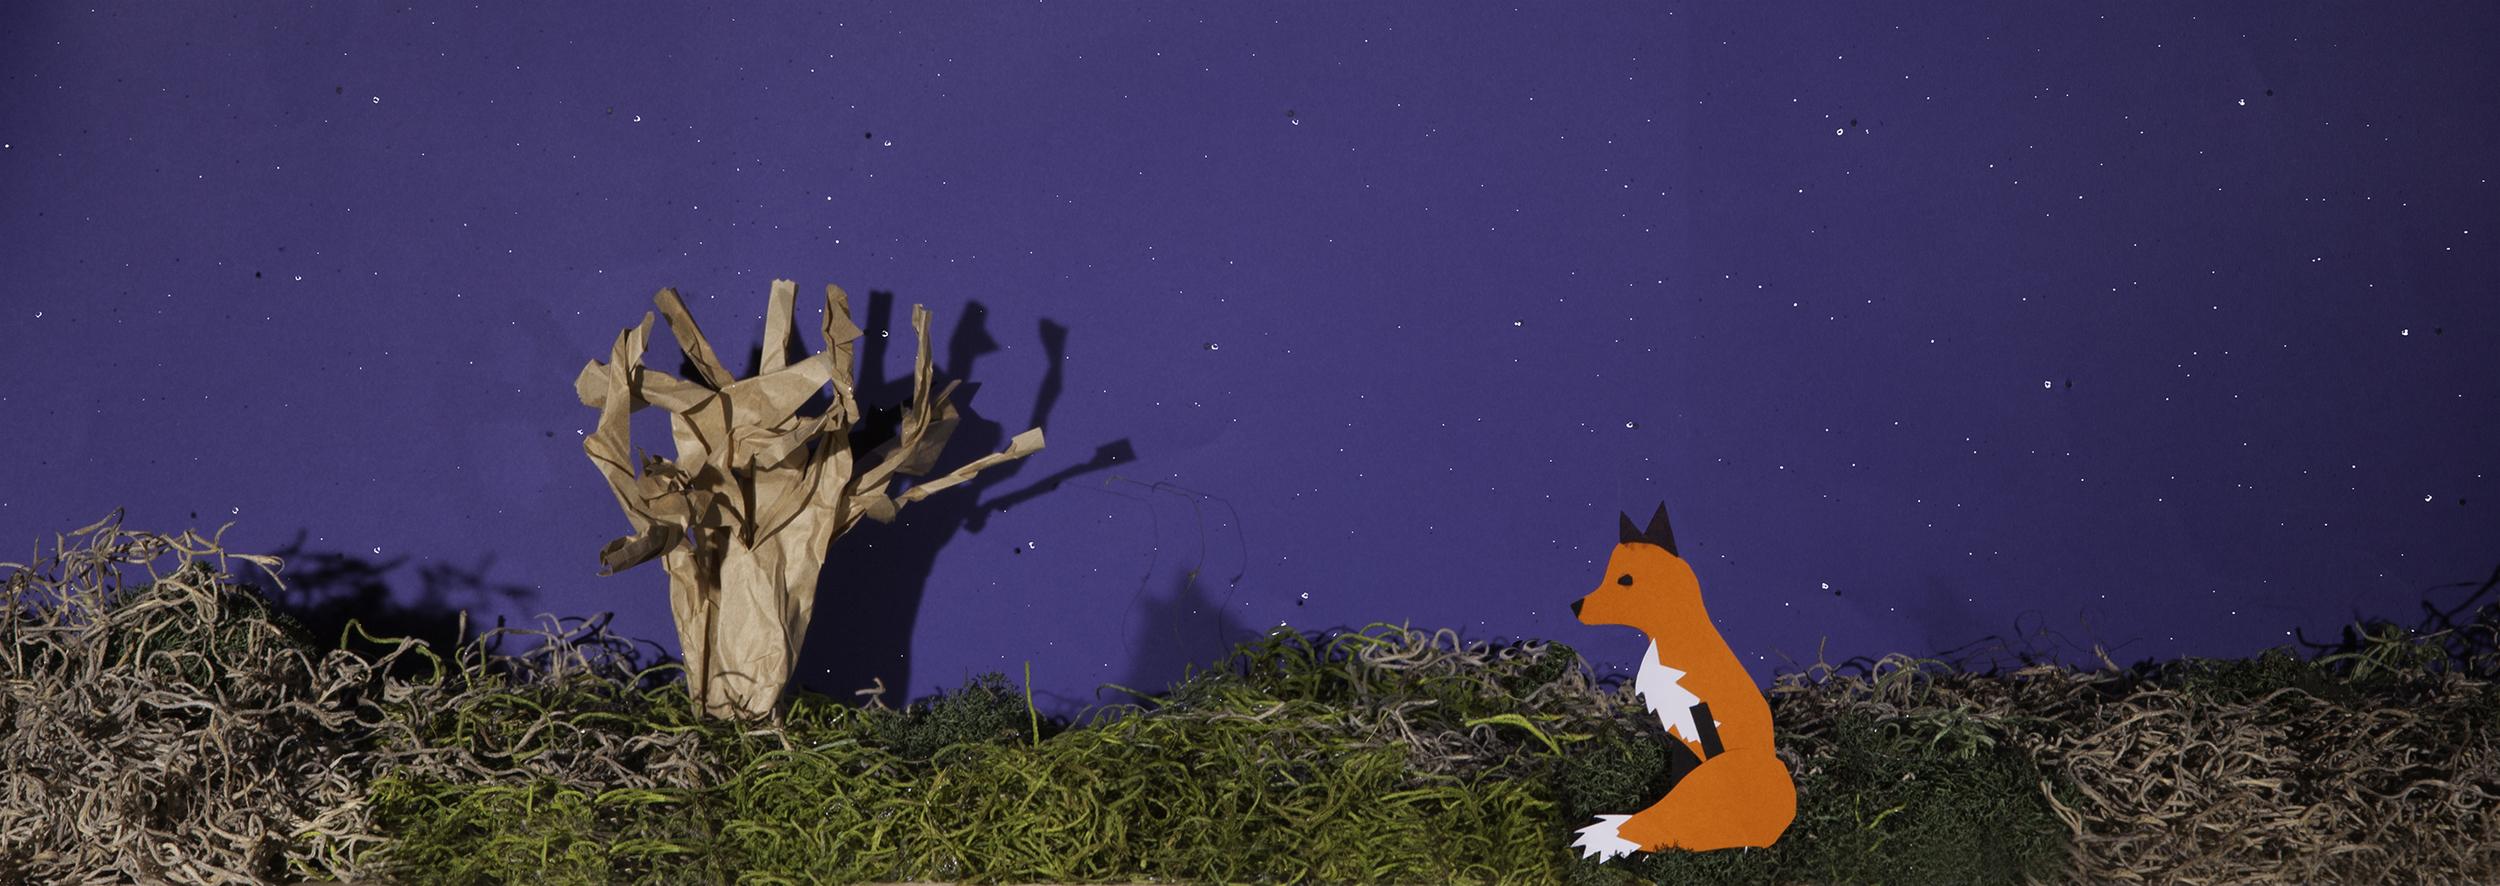 Fantastic Mr. Fox Dioarama